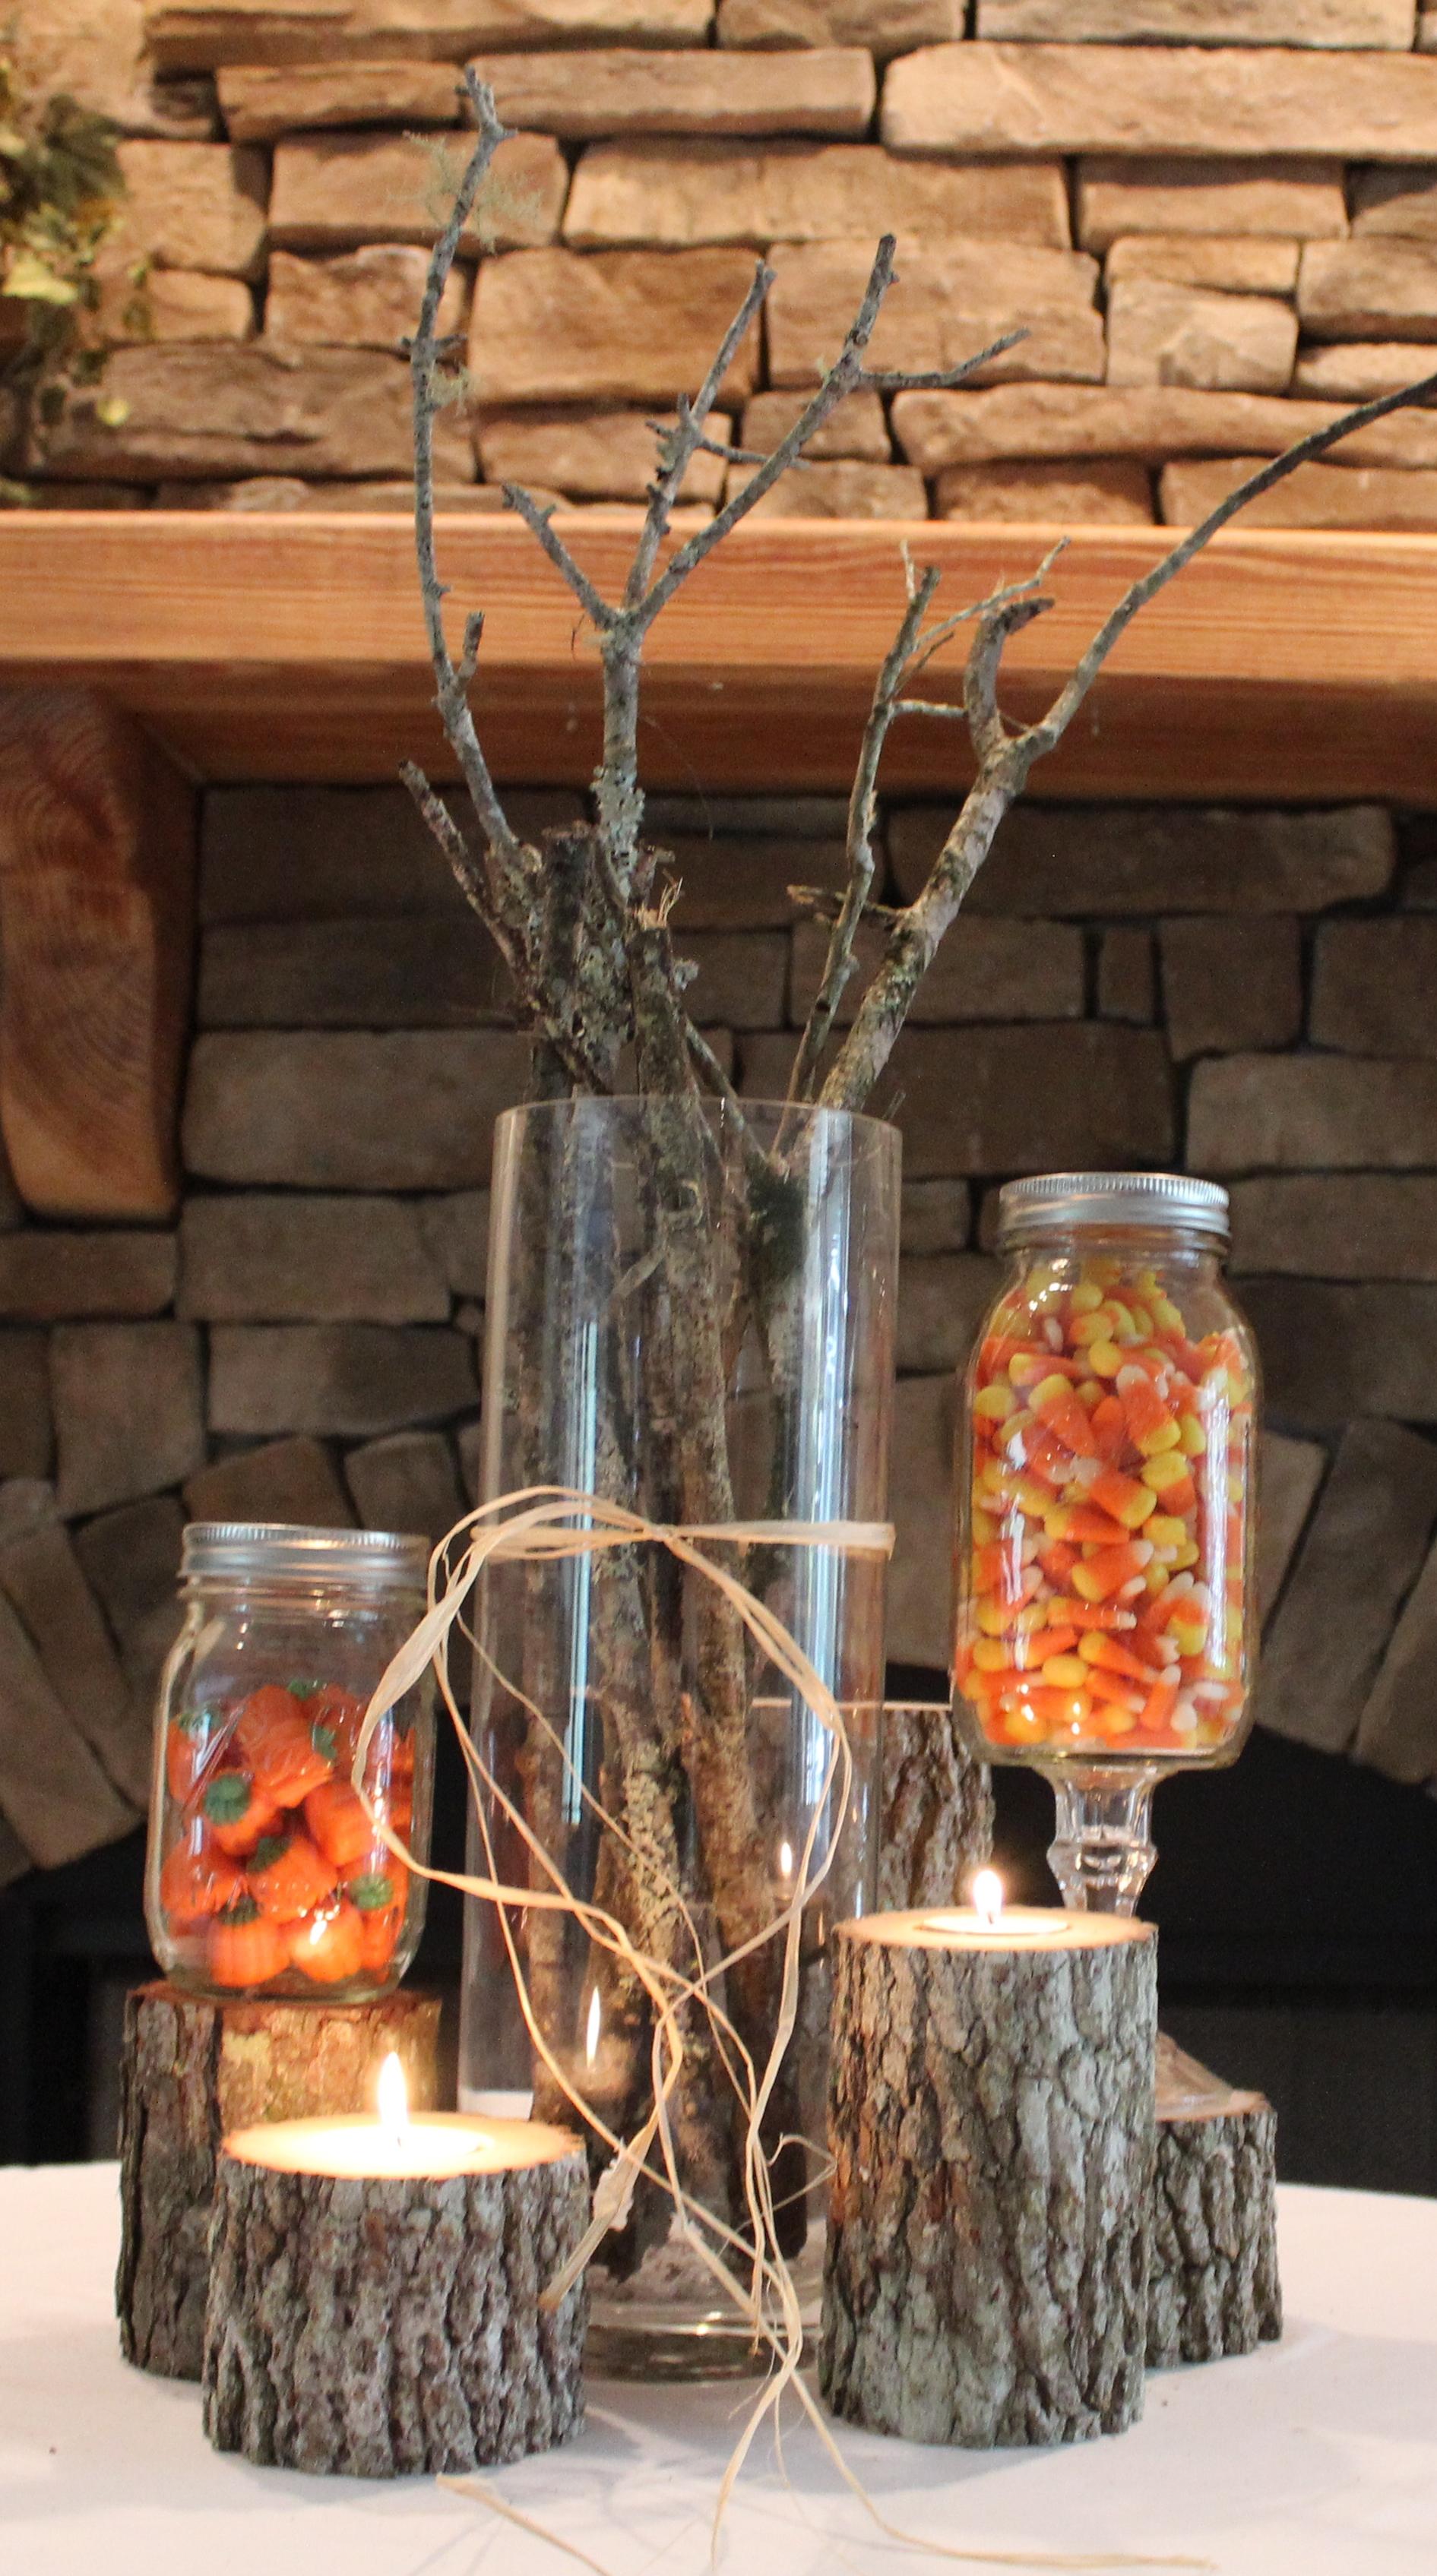 Wood Candle Pillars w/ Sticks Vase